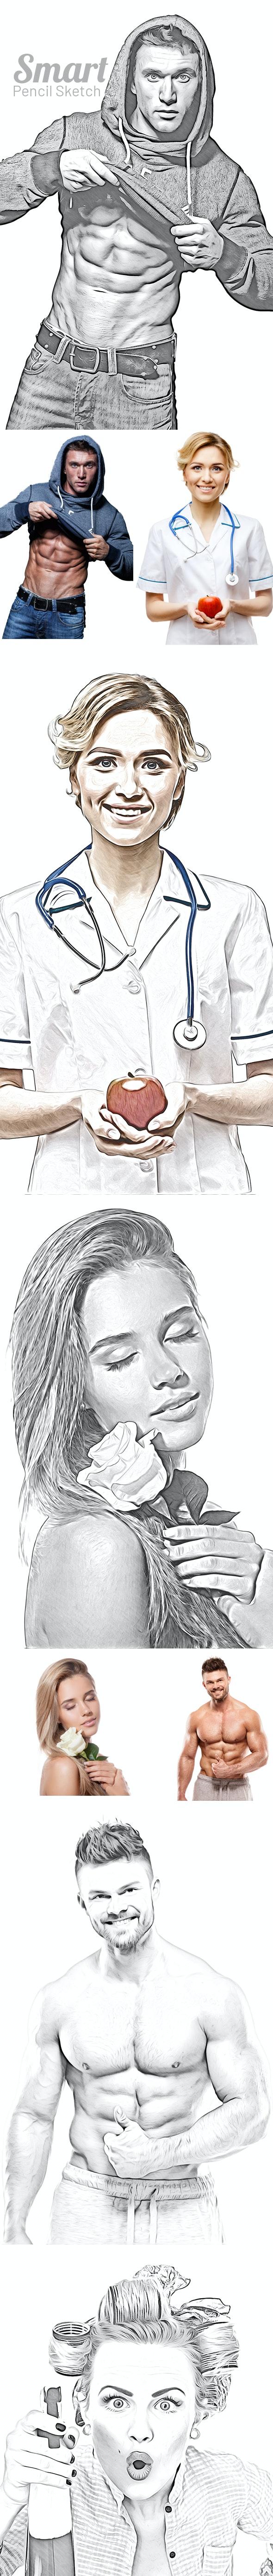 Smart Pencil Sketch - Actions Photoshop